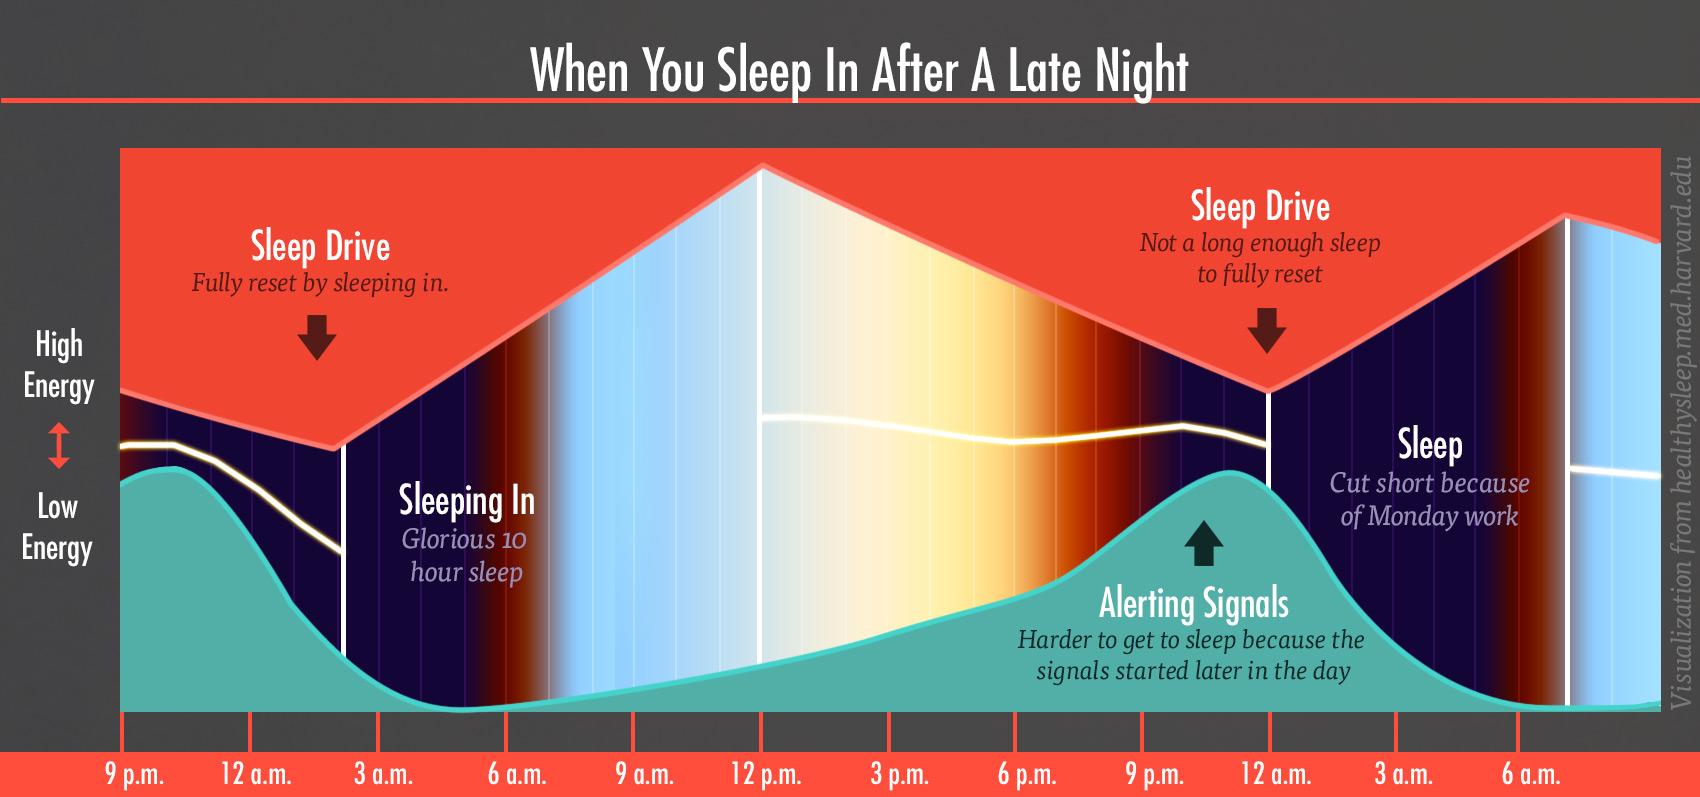 energy-levels-sleep-drive-alert-chart-3-bony-bombshell